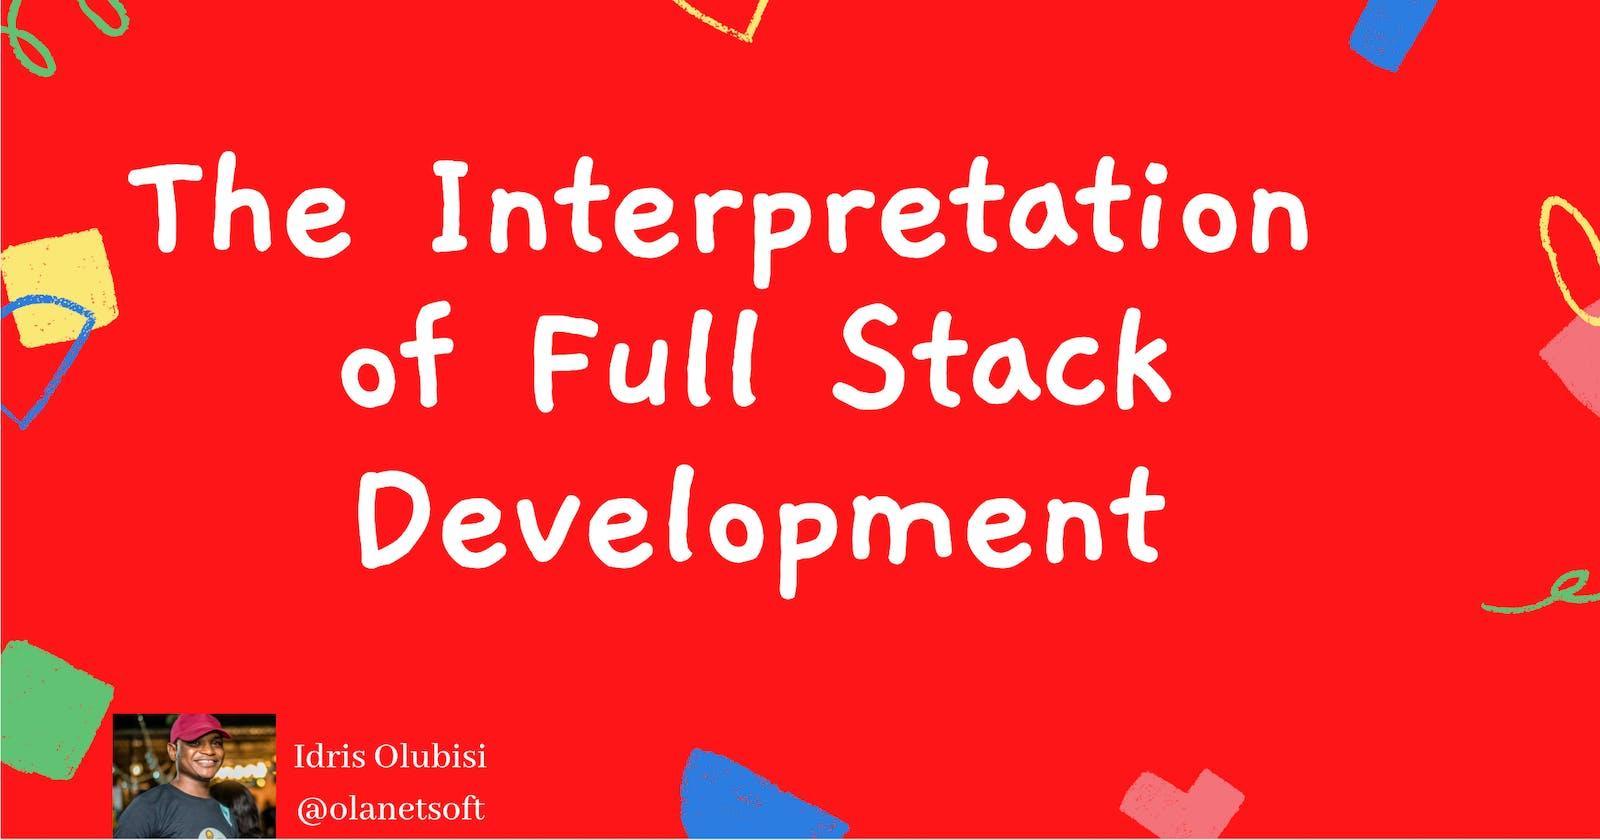 The Interpretation of Full Stack Development